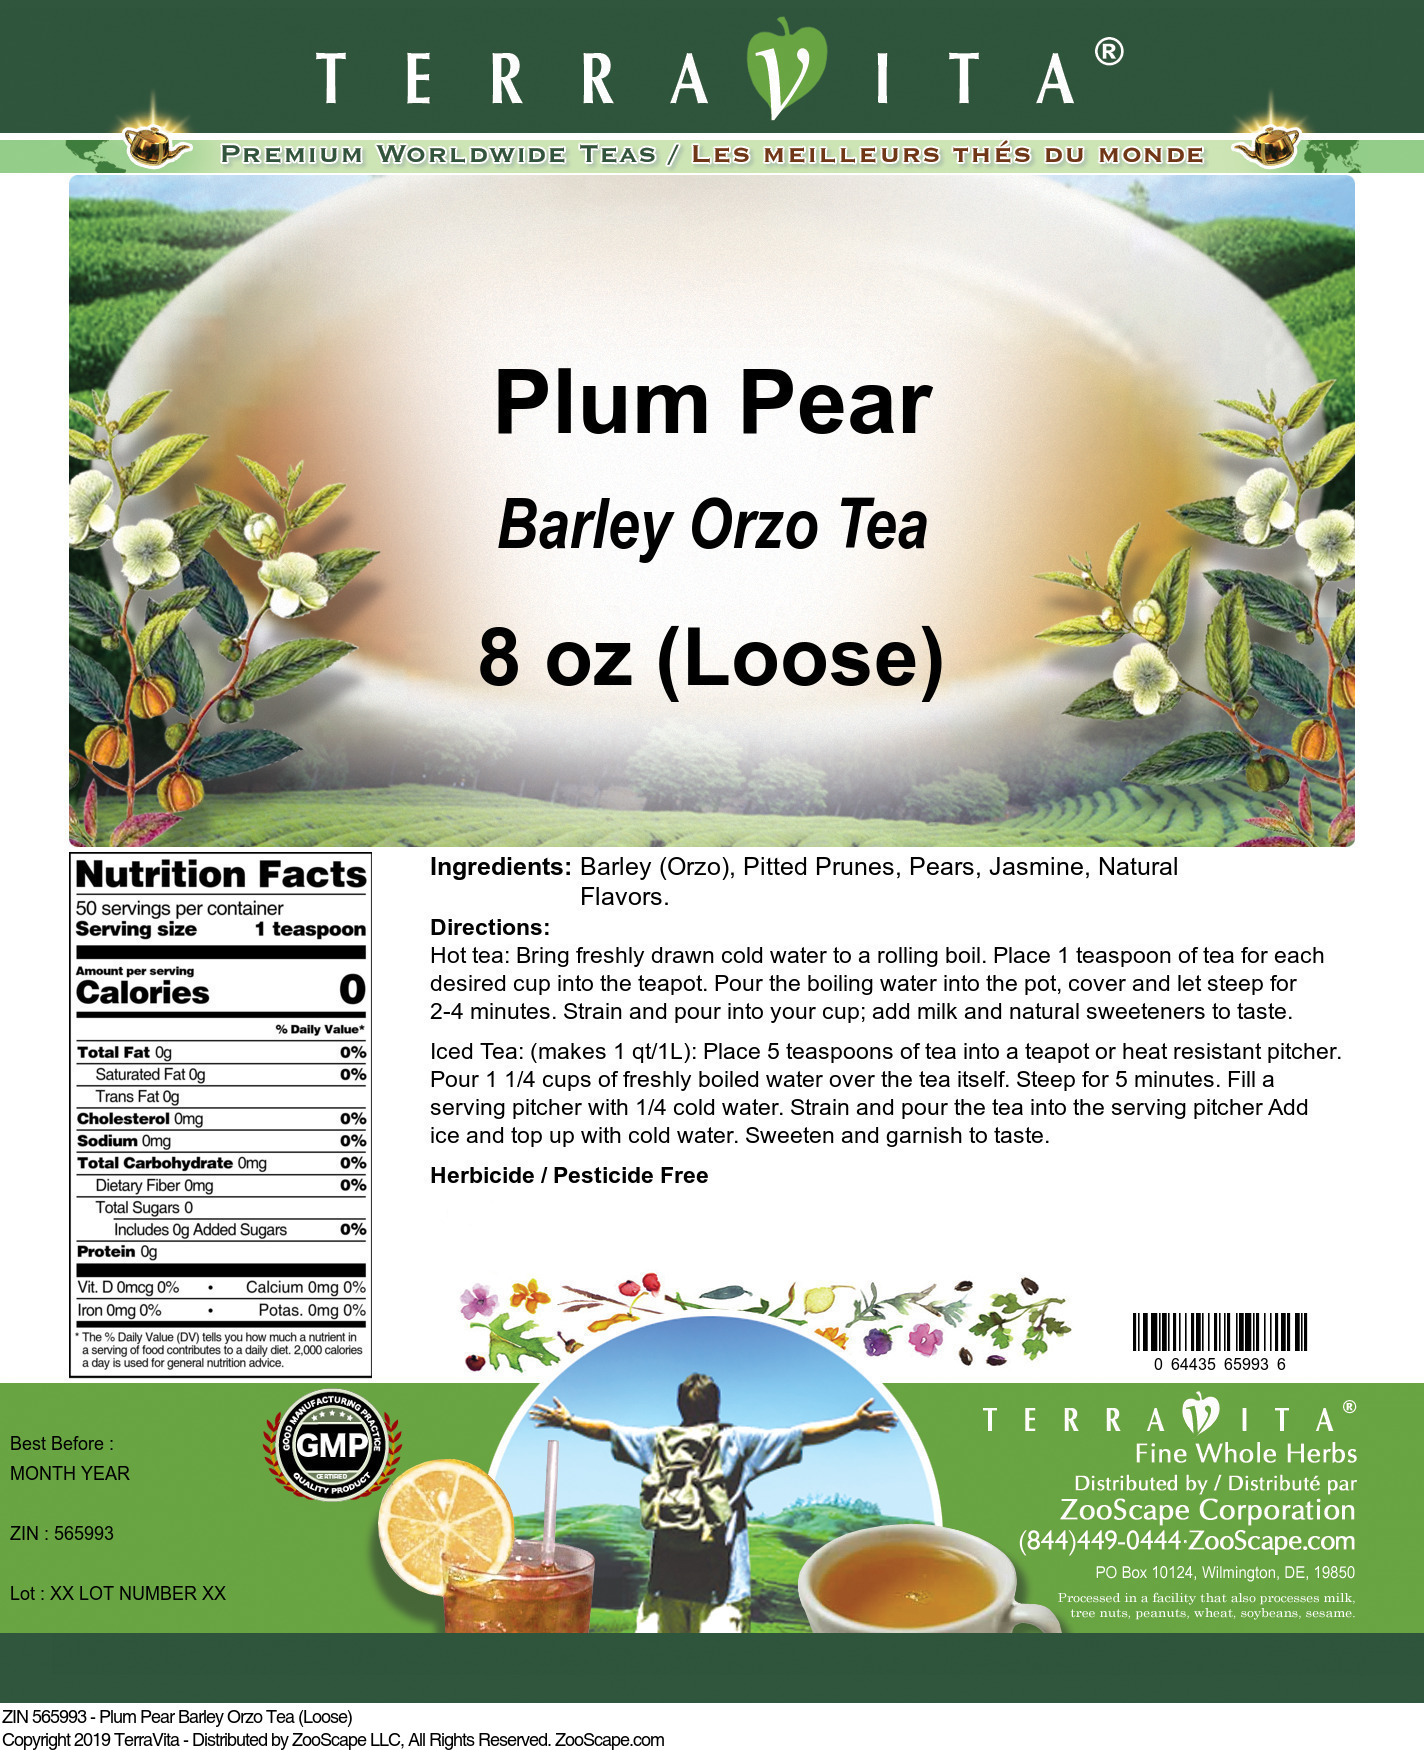 Plum Pear Barley Orzo Tea (Loose)